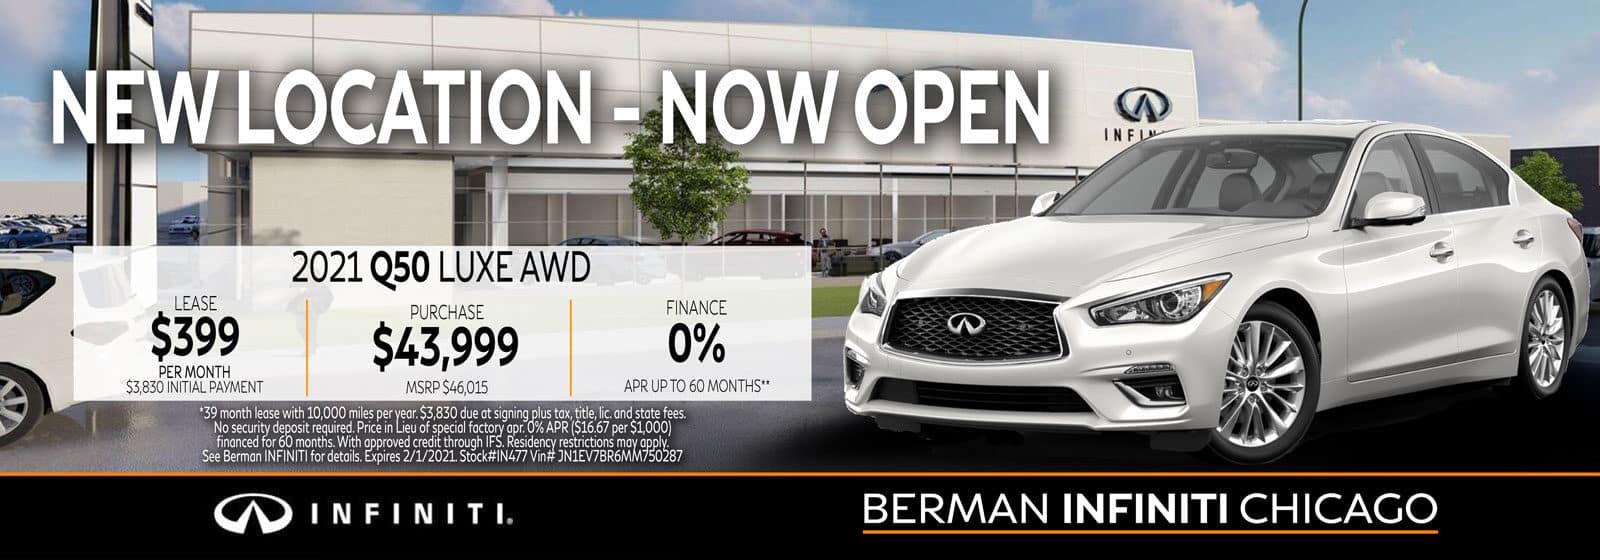 New 2021 INFINITI Q50 January offer at Berman INFINITI Chicago!